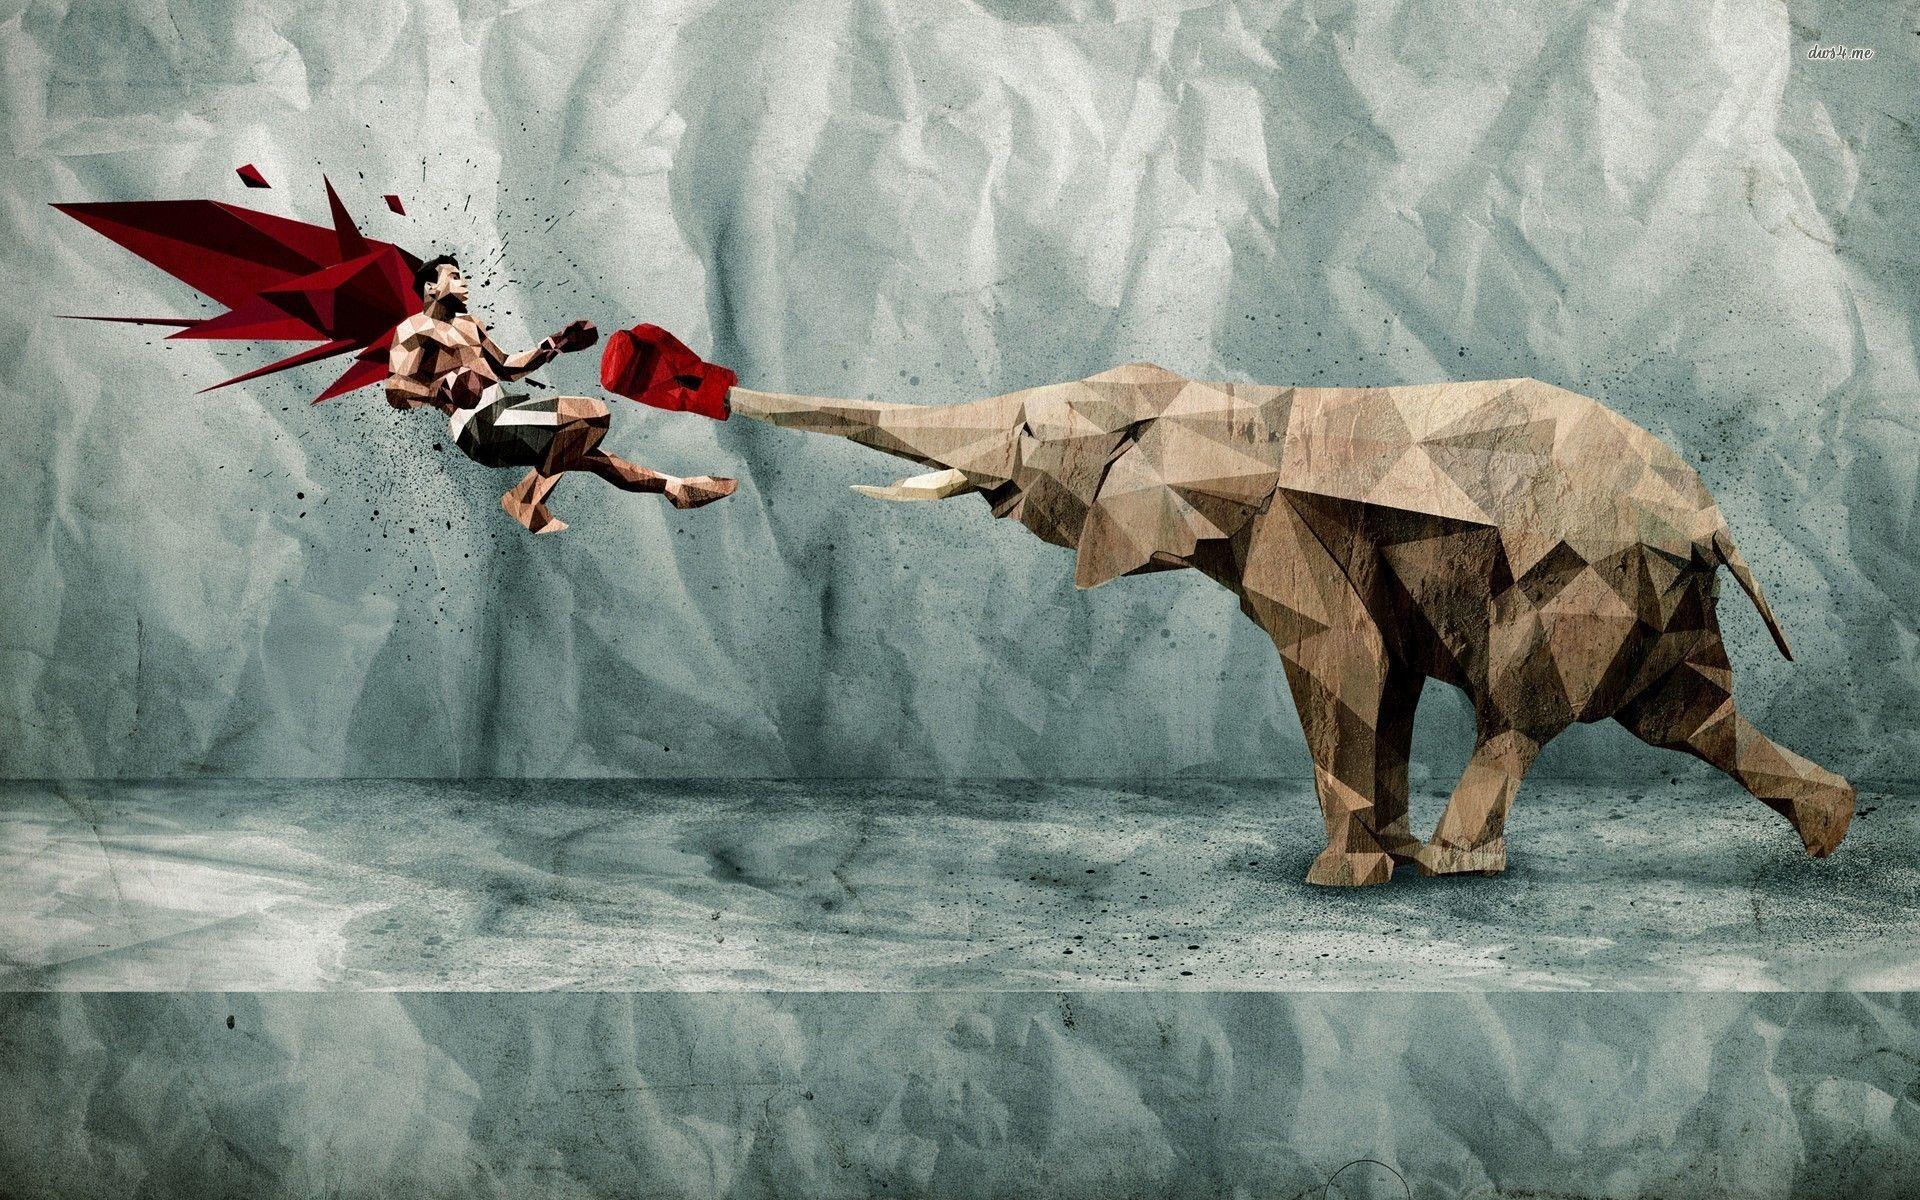 Hd wallpaper elephant - Elephant Boxing Digital Art Hd Desktop Wallpaper Box Wallpaper Elephant Wallpaper Digital Art No